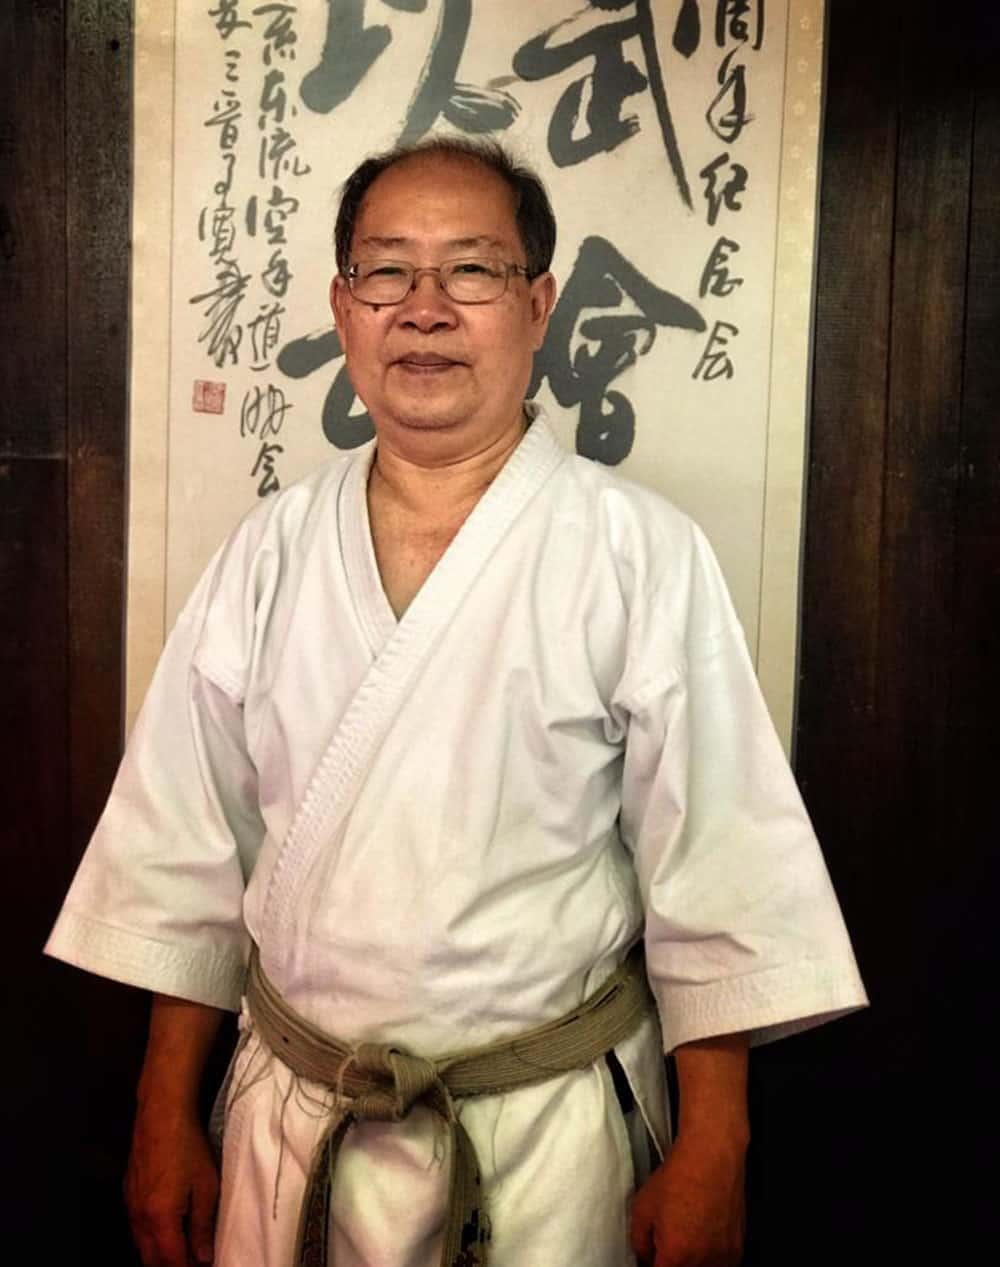 Sensei Sunny Tan